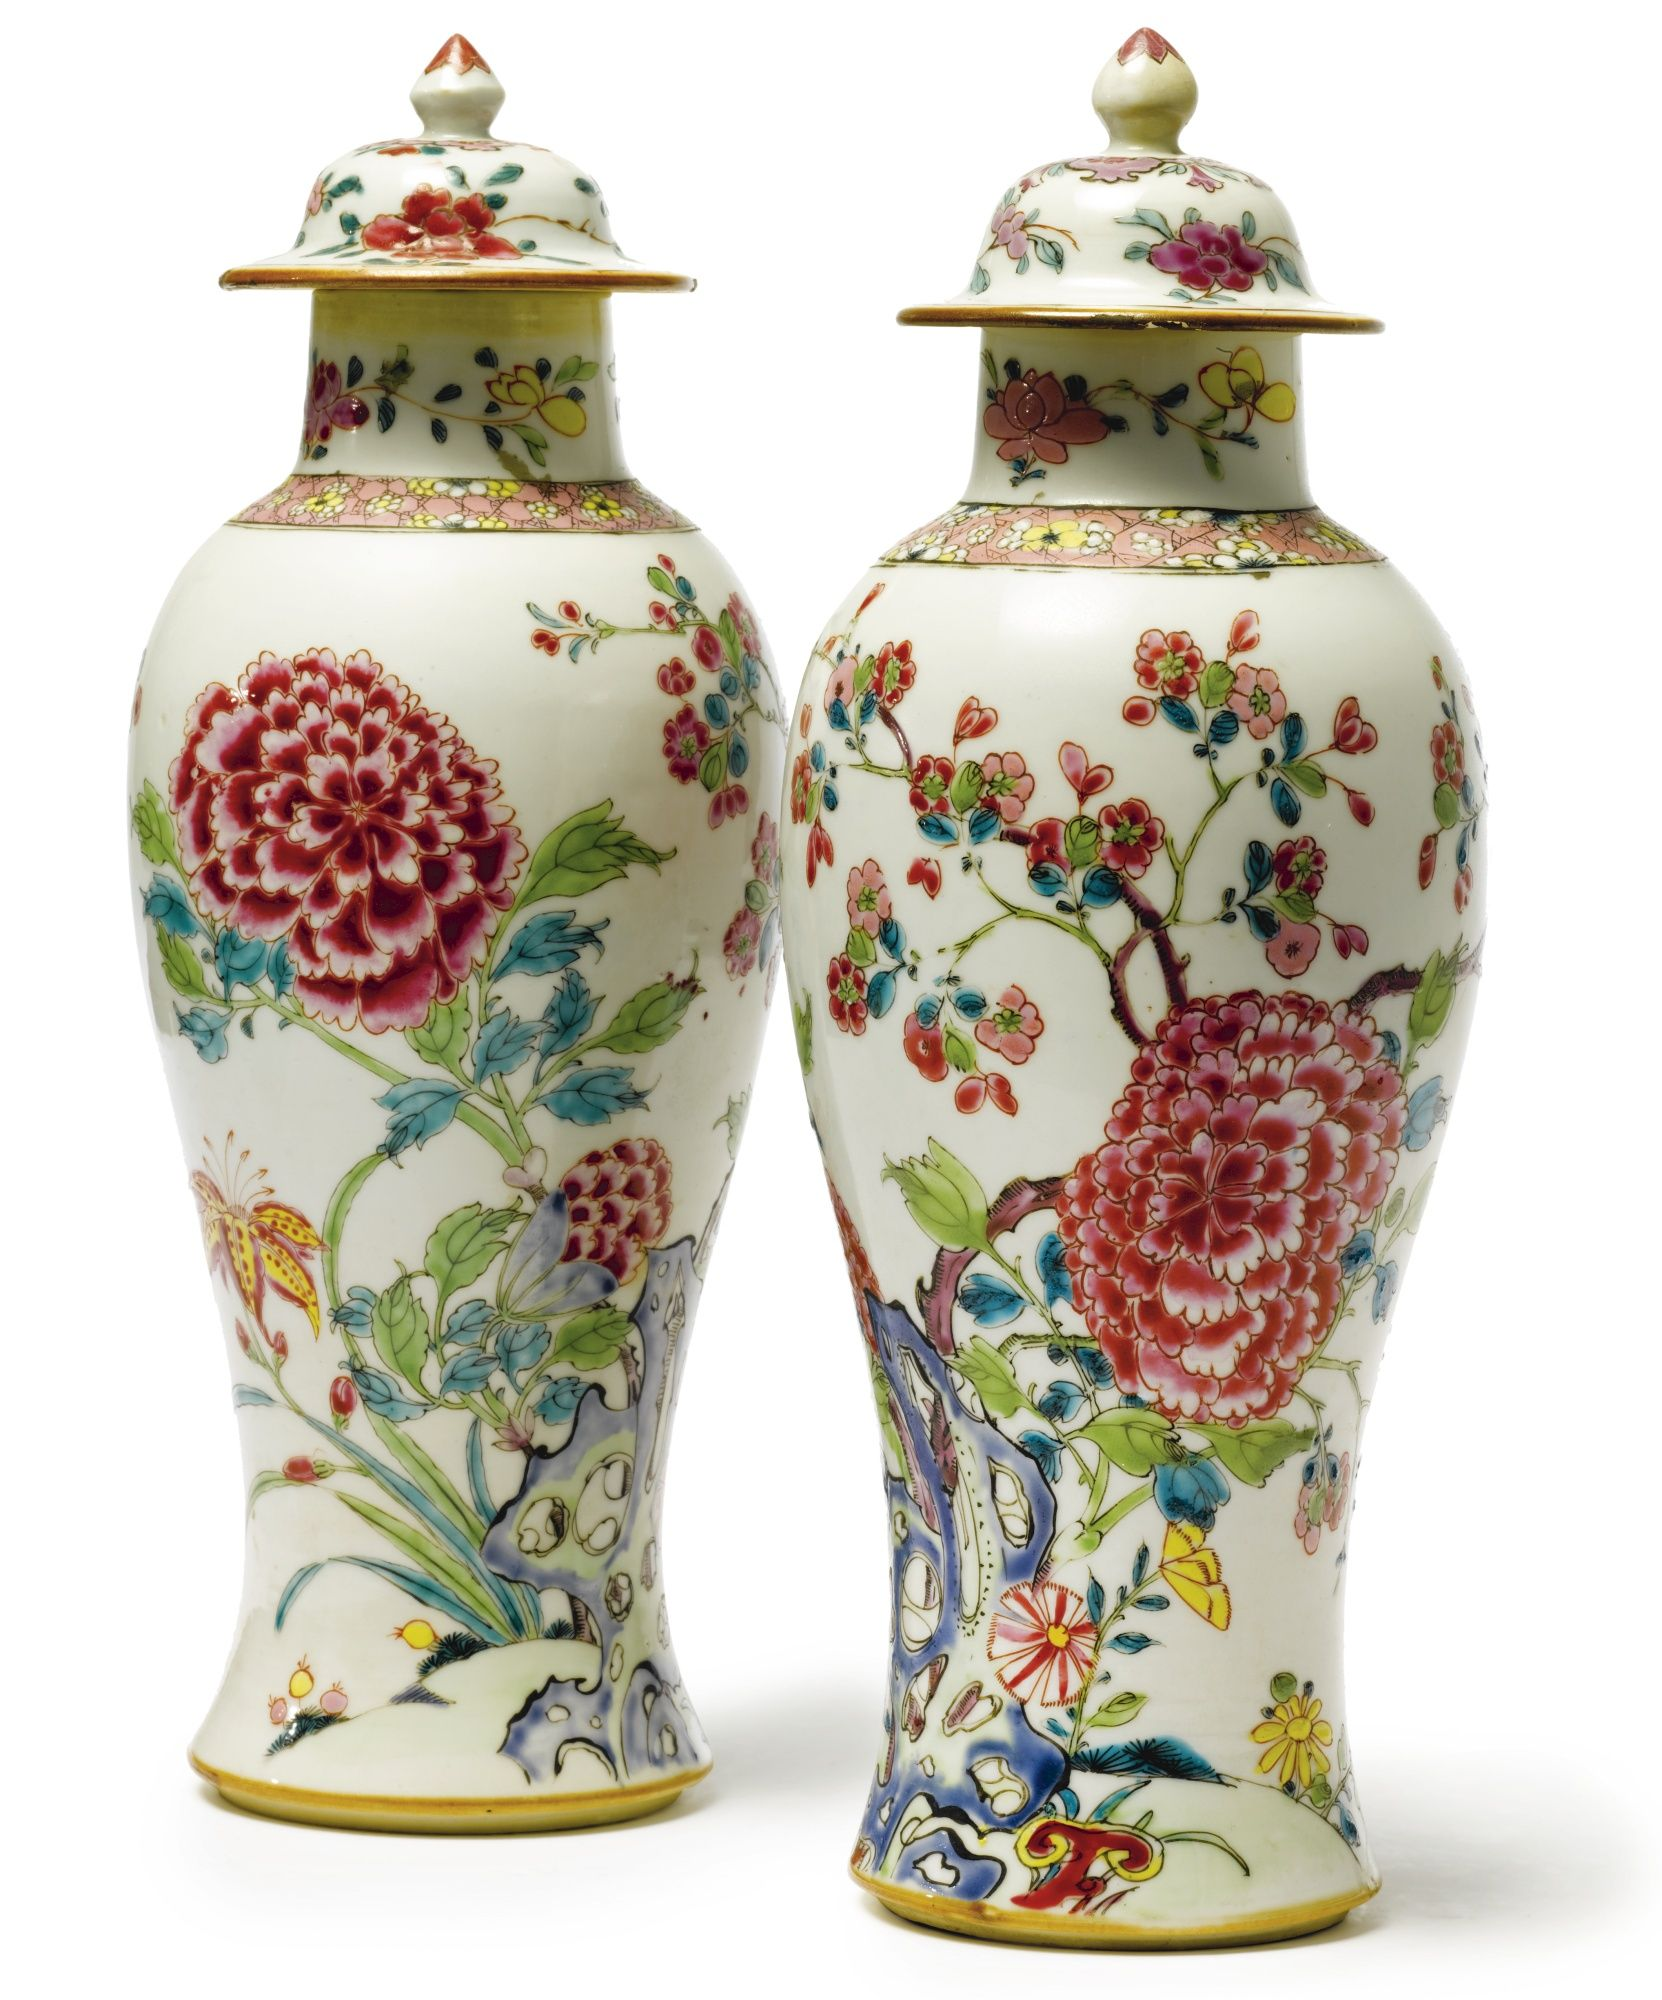 China  old  Porcelain  Qing Dynasty  Phoenix flower and bird  vase